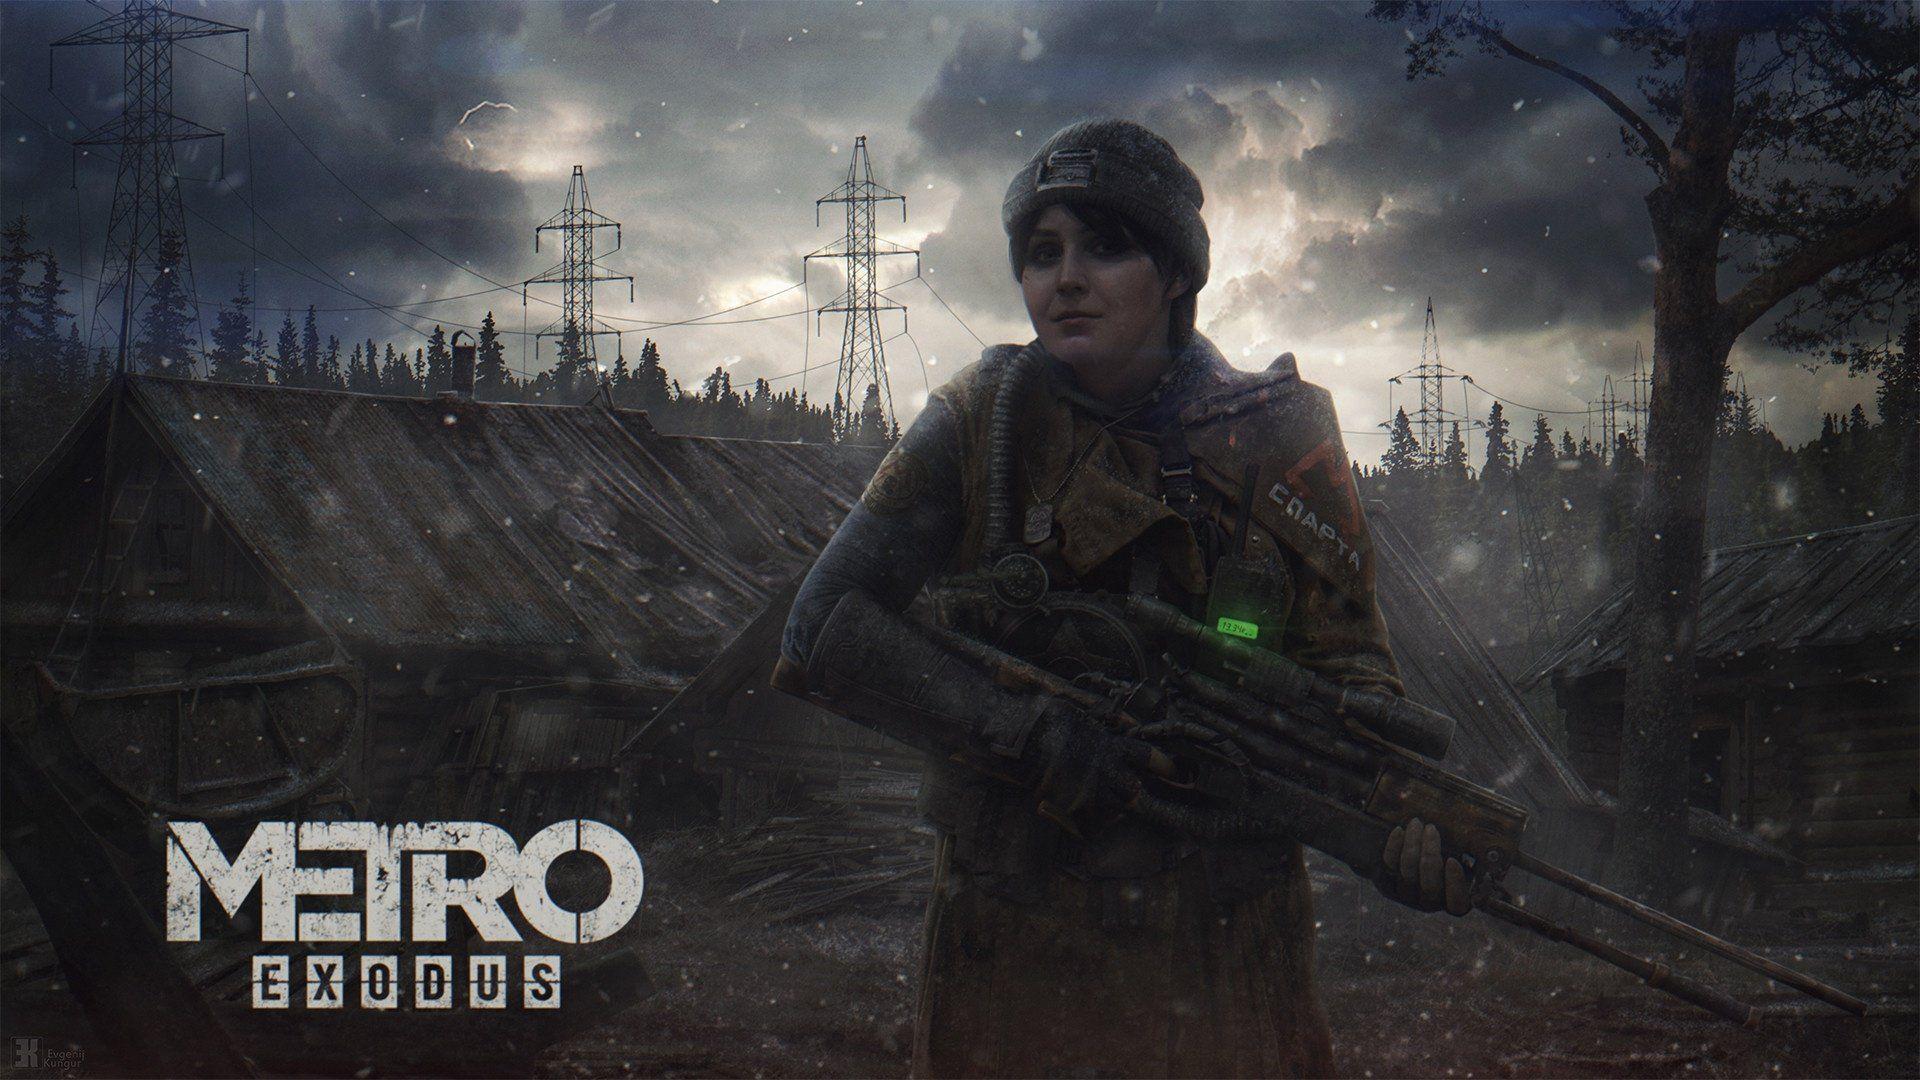 1920x1080 Metro Exodus Wallpaper Background Image View